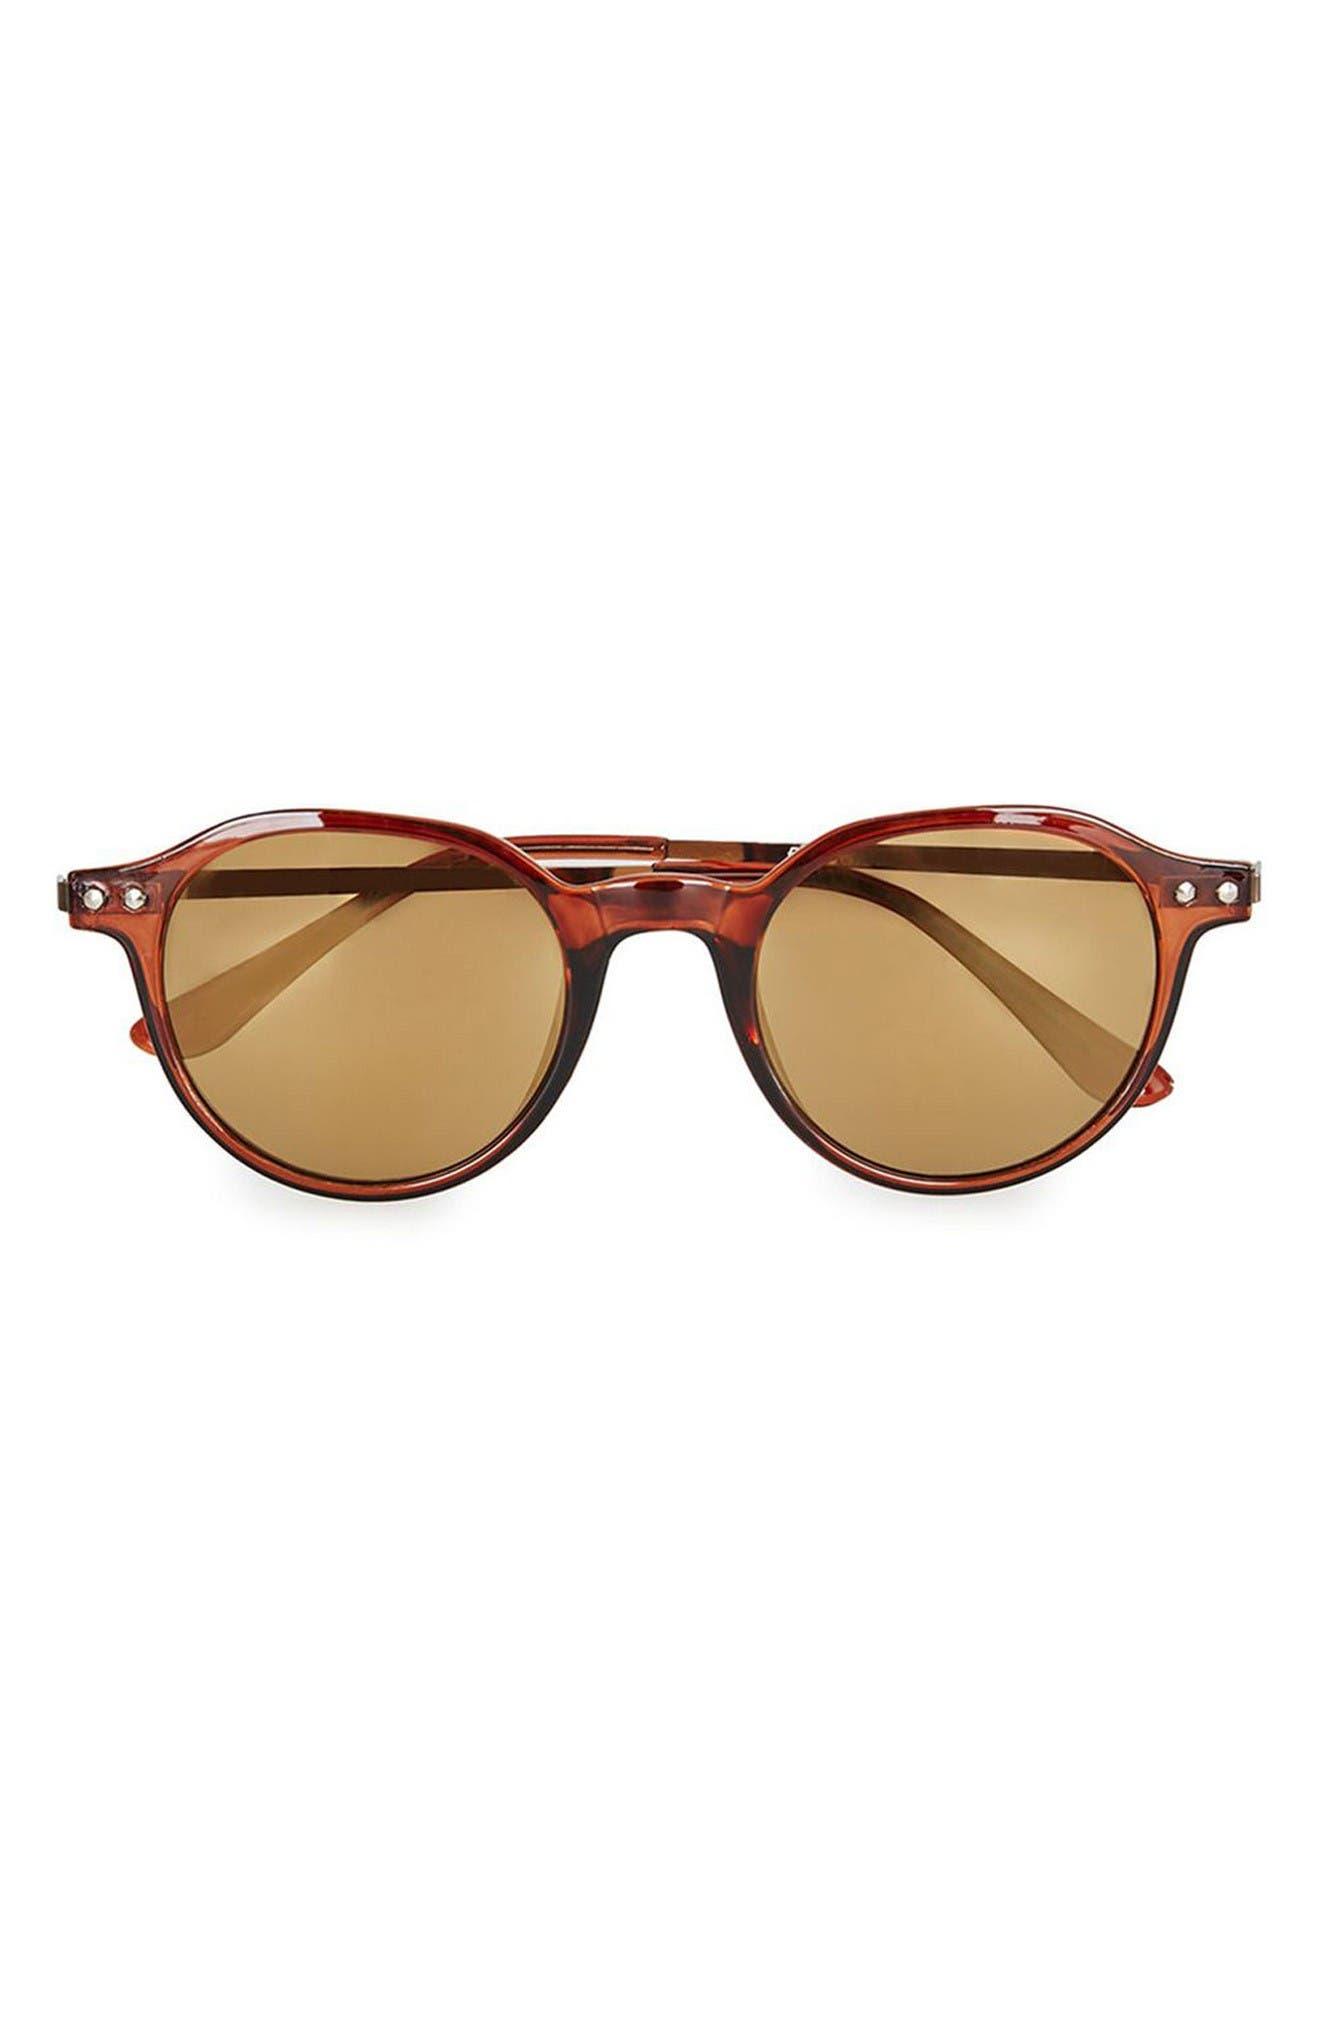 Topman 45mm Round Sunglasses